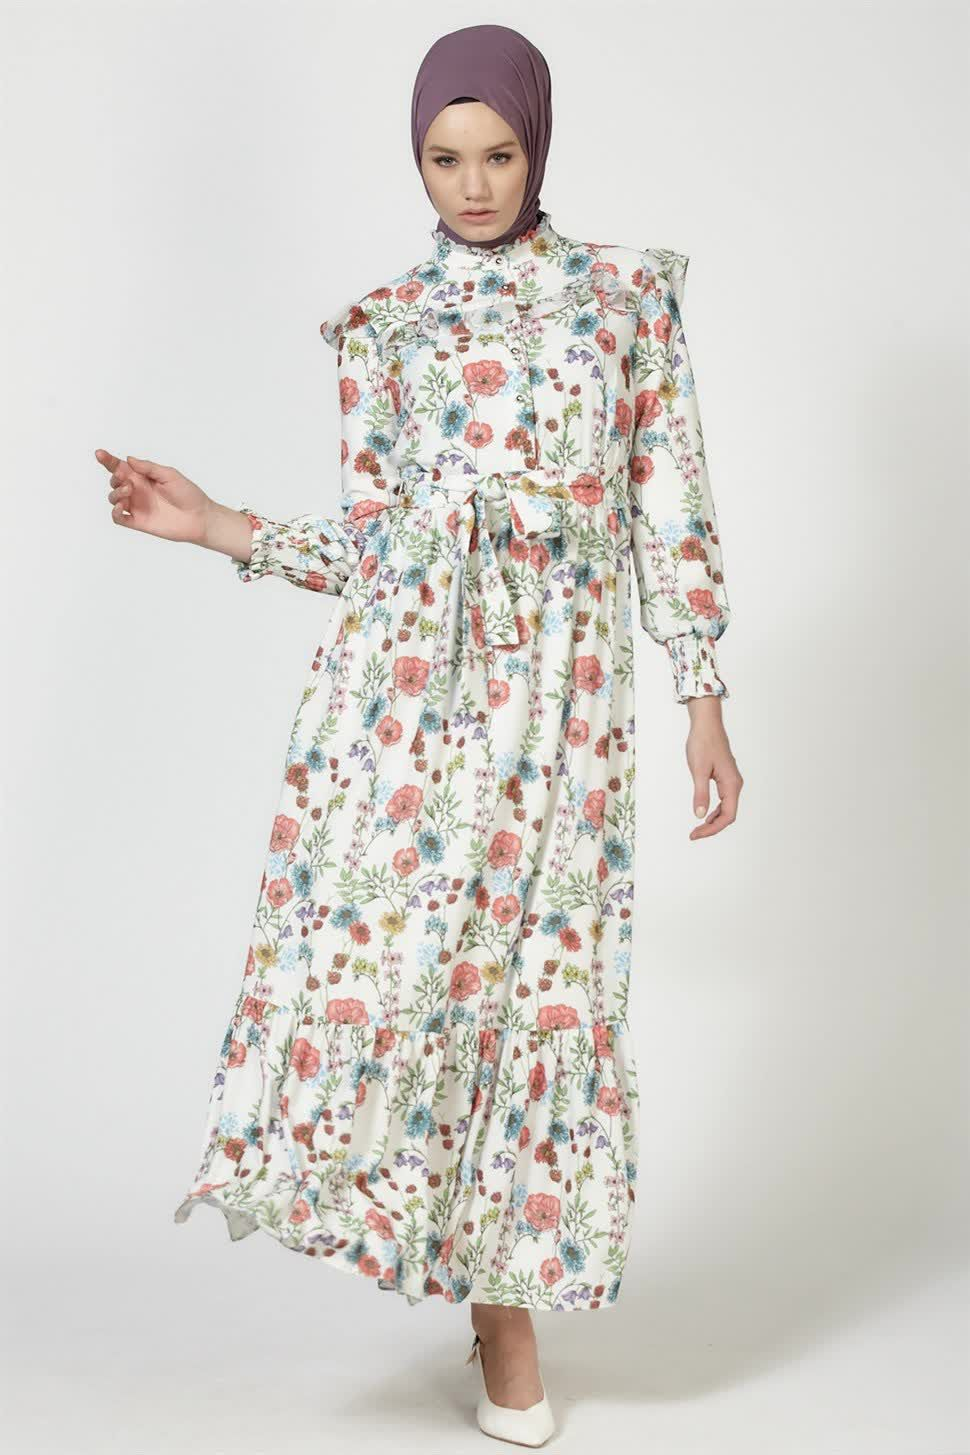 Armine Cicek Desenli Elbise Ekru Armine Elbise Modelleri 2020 Elbise Moda Stilleri Elbise Modelleri